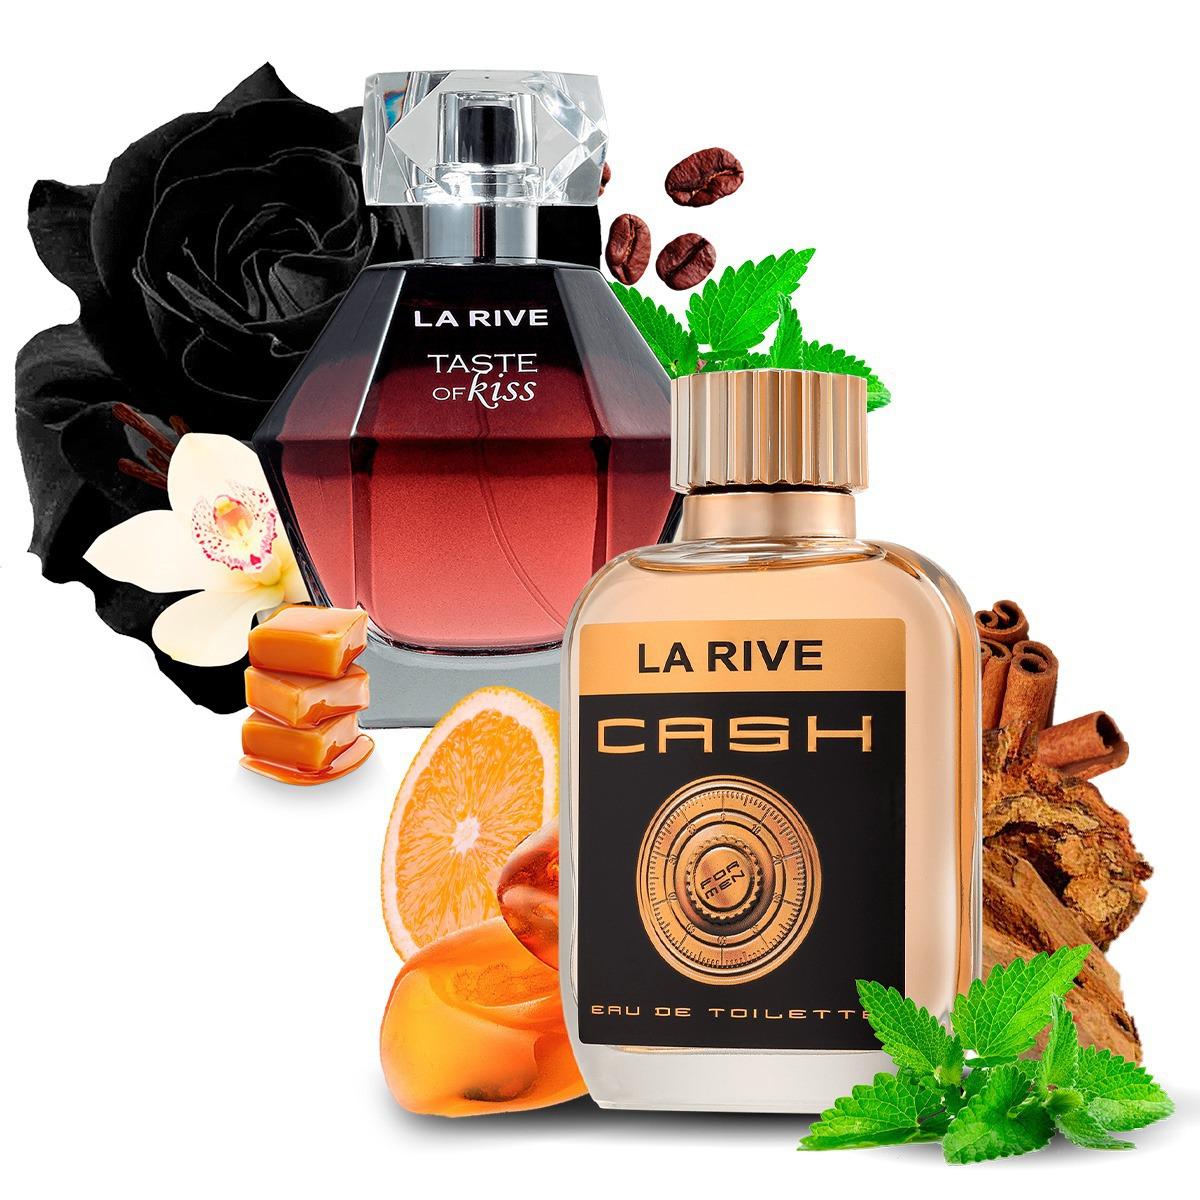 Kit 2 Perfumes Importados Cash Man e Taste of Kiss La Rive